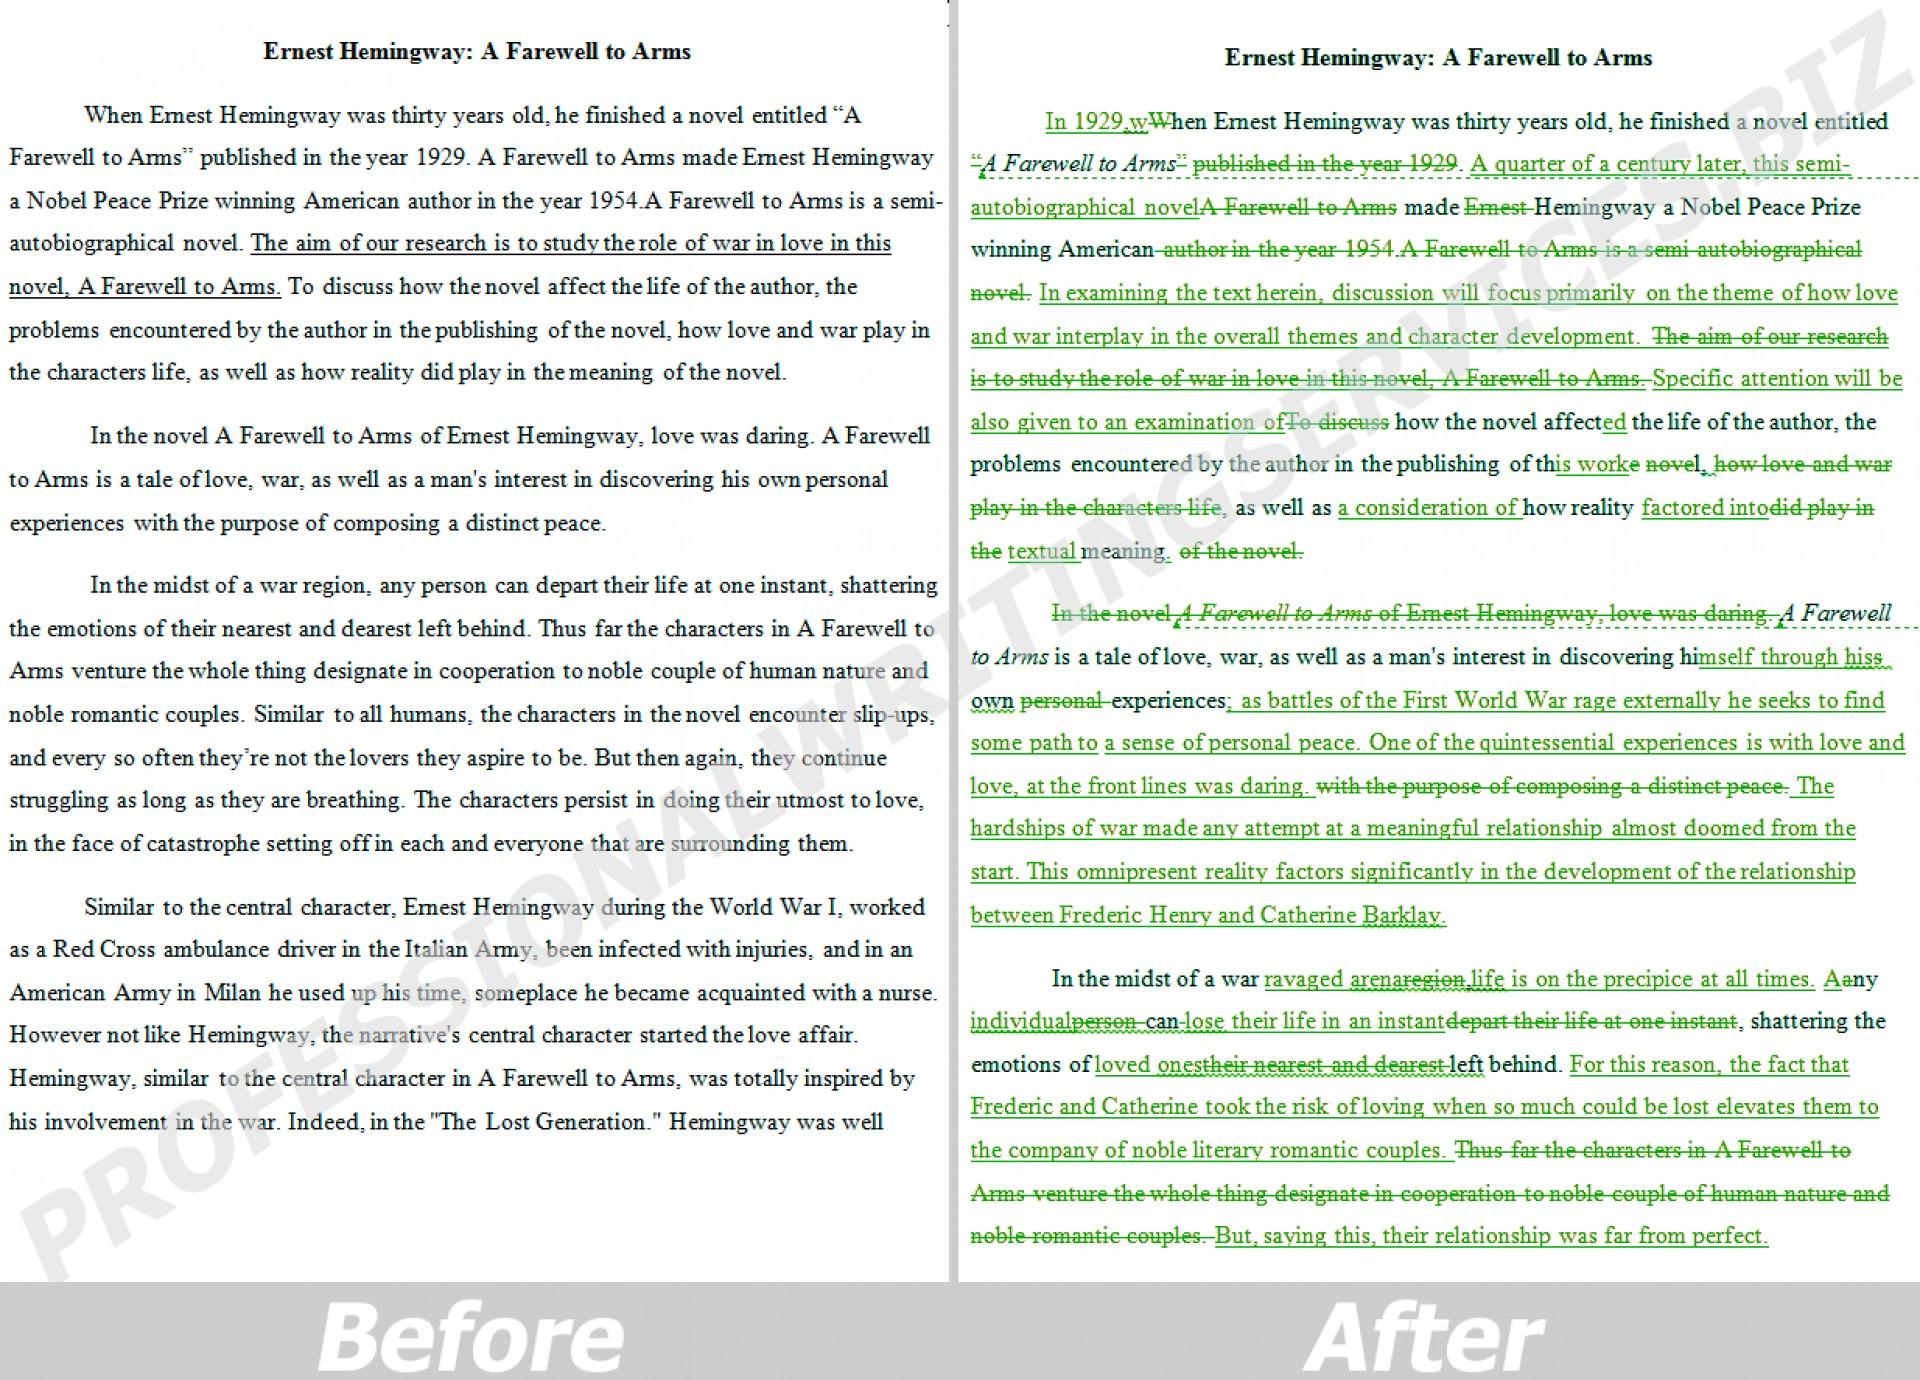 004 Paraphrase Essay Professionalwritingservices Sample Stirring Means On Criticism Paraphrasing Topics 1920